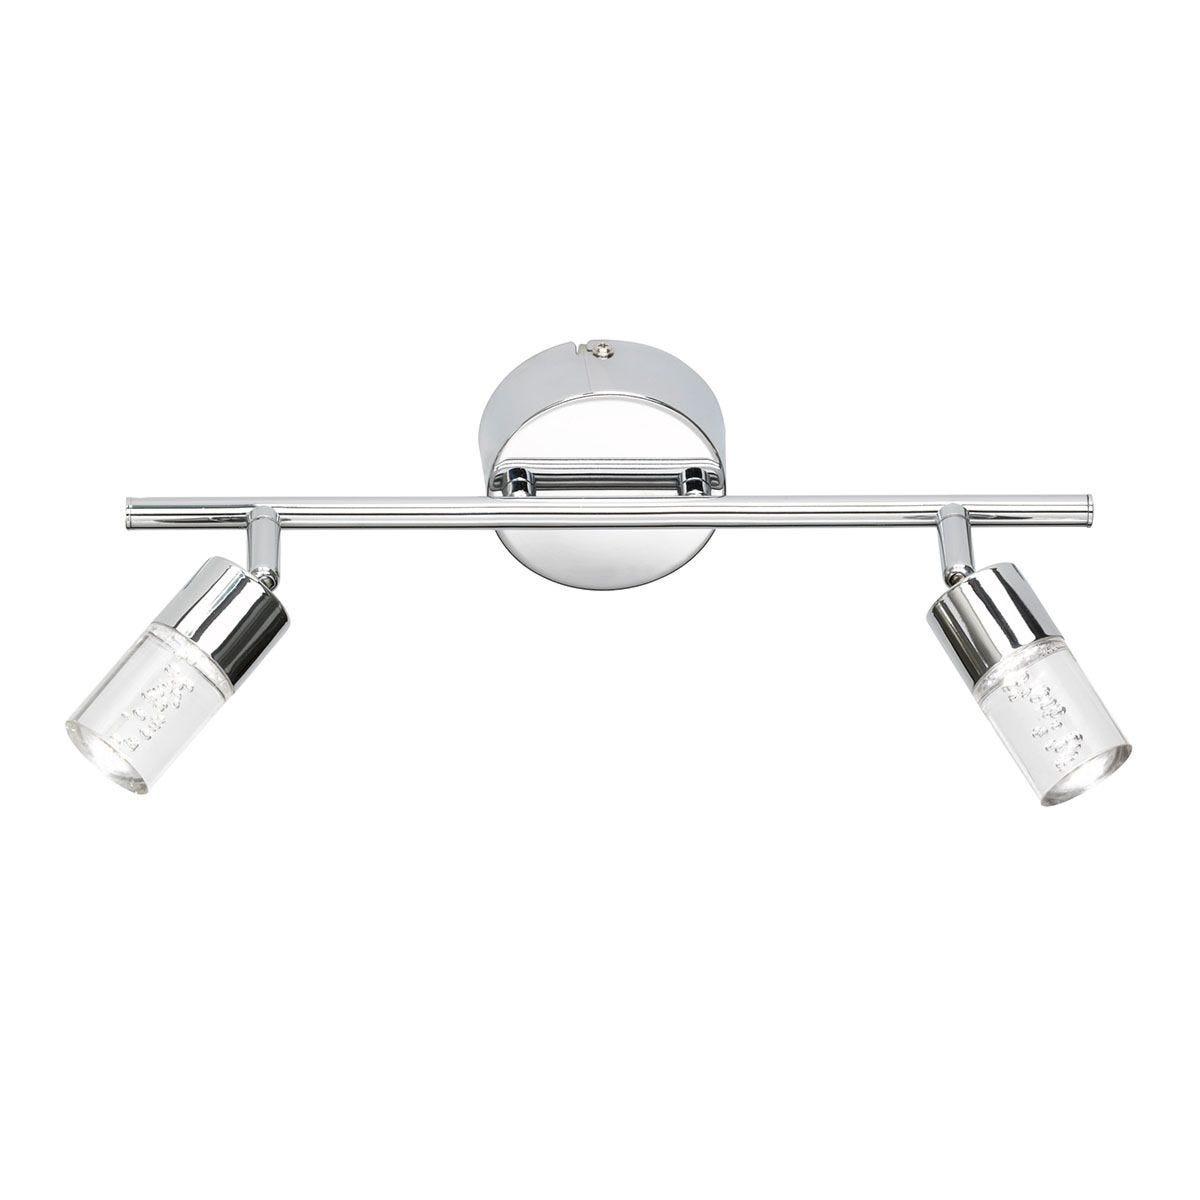 Action Lugo 2 LED Lamp Pendant Bar/Spotlight - Chrome